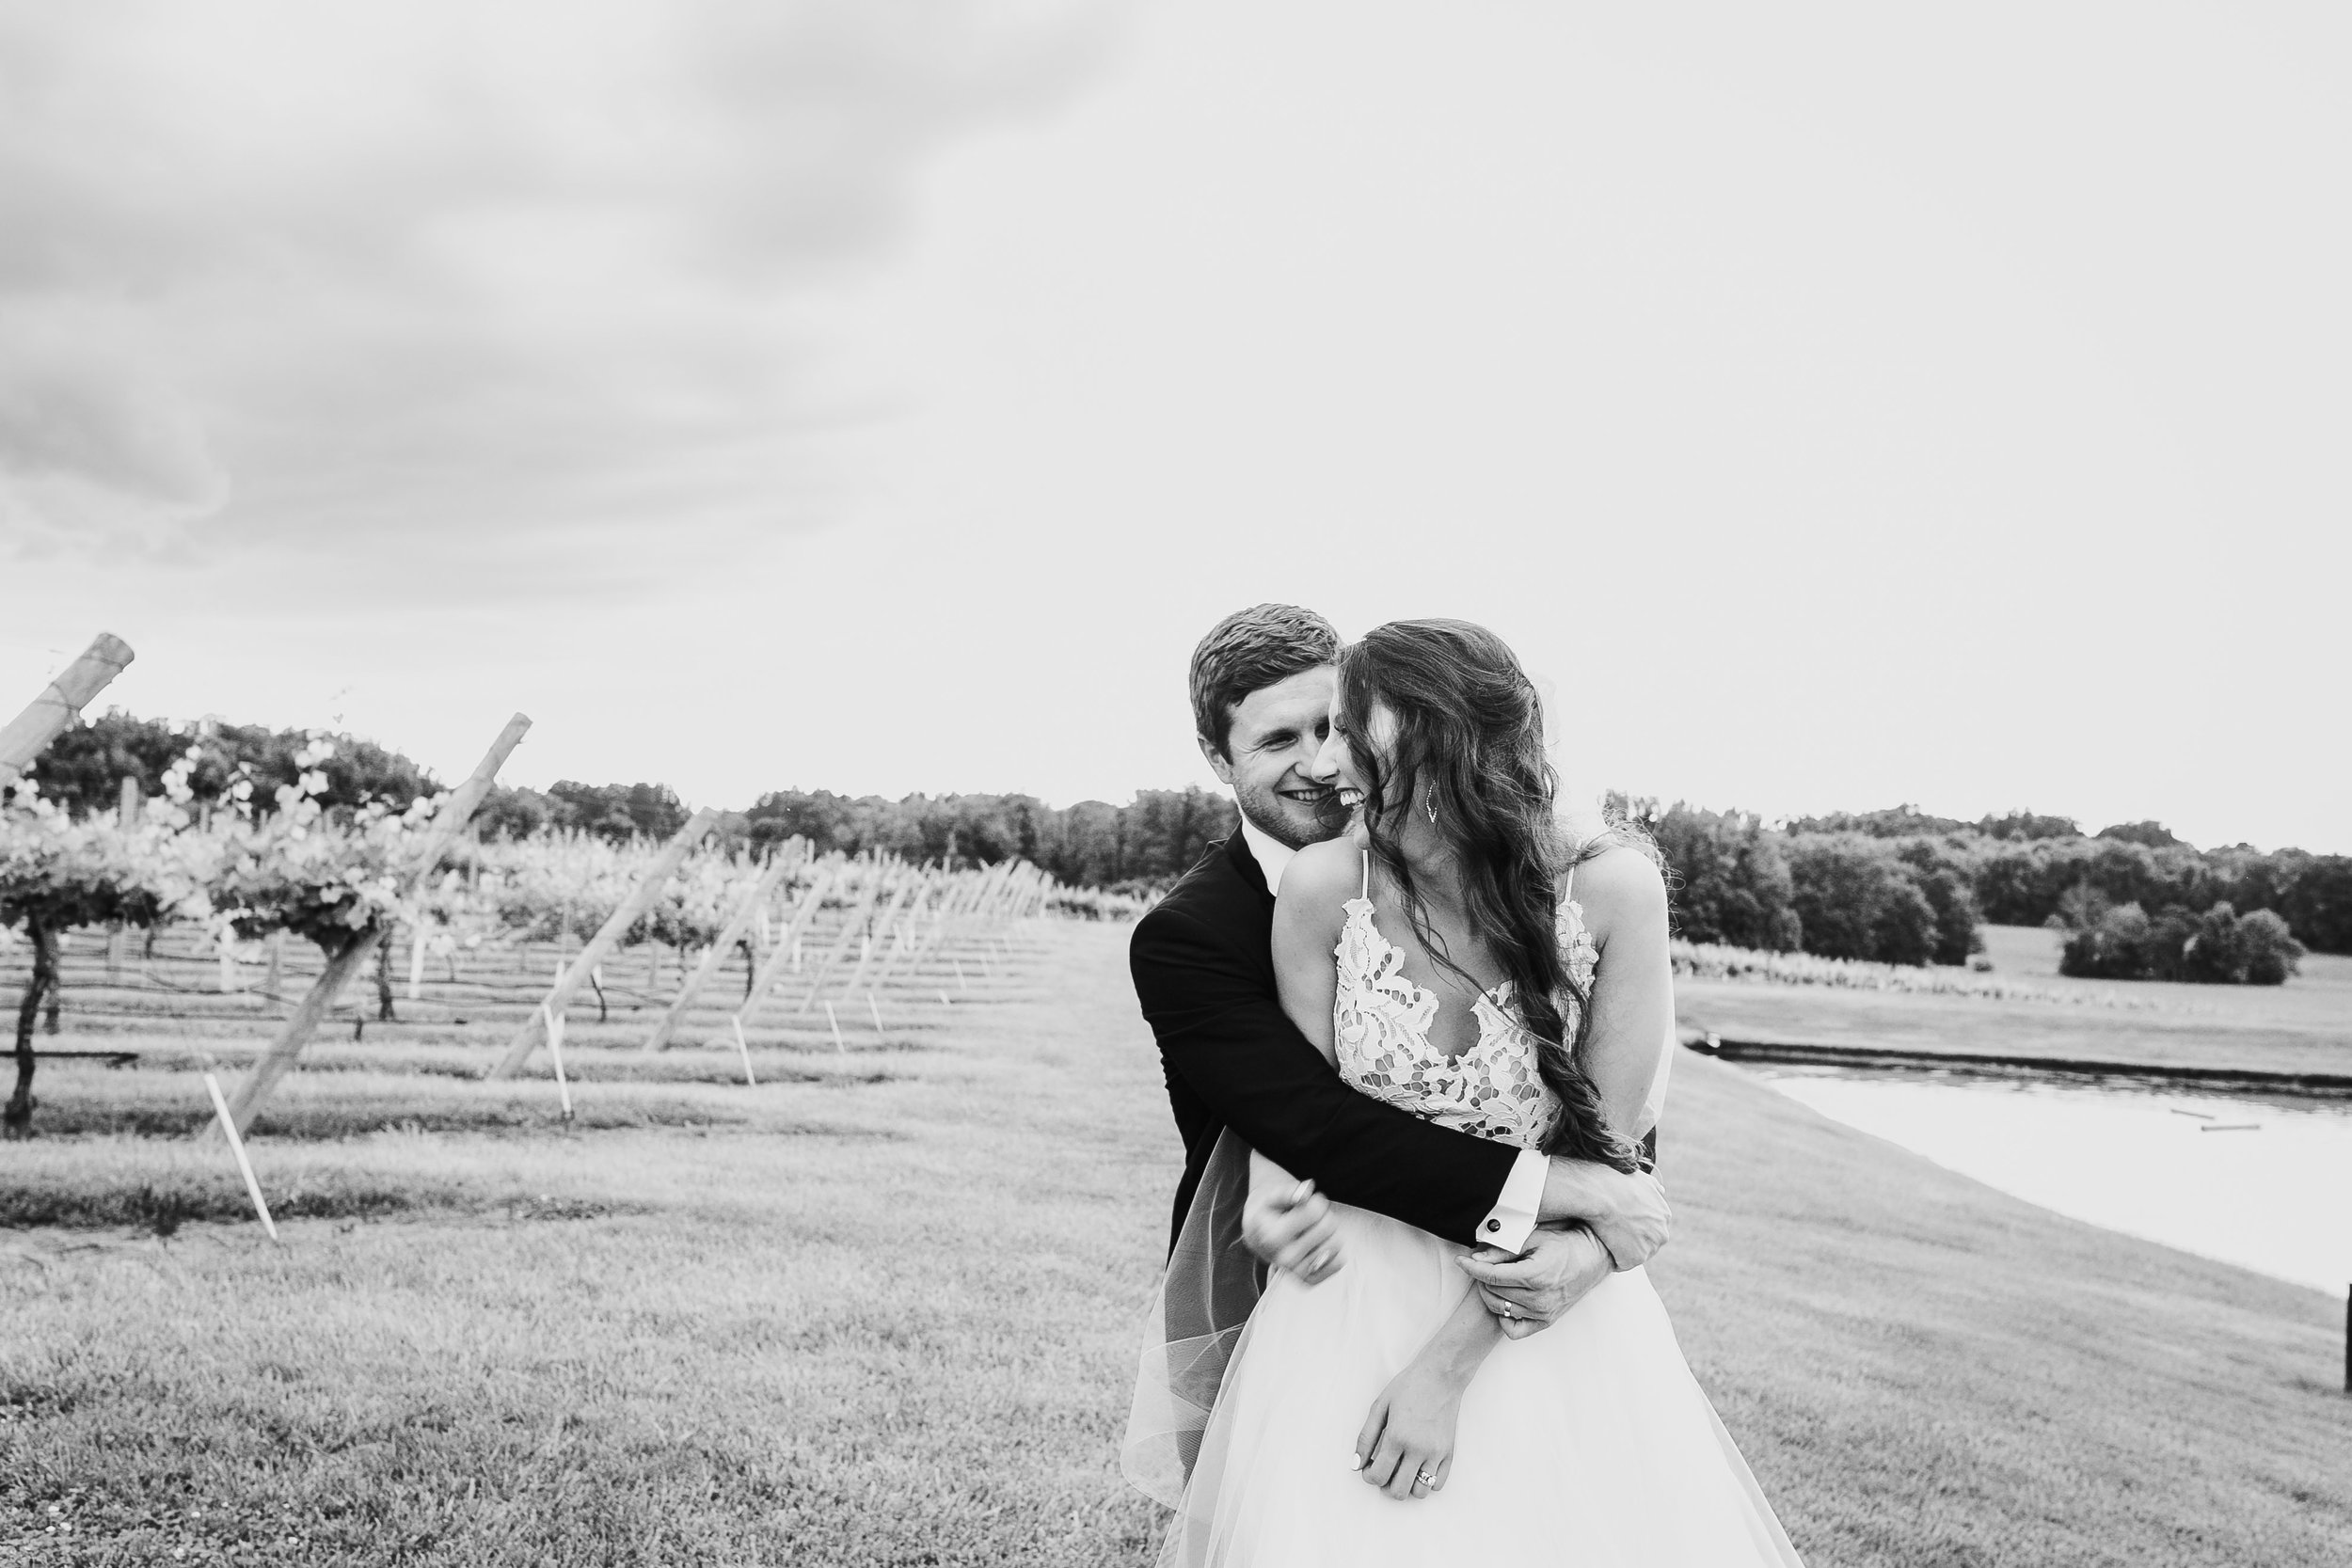 Bohemian-Wedding-Elopement-Photographer-Carolina-48.jpg